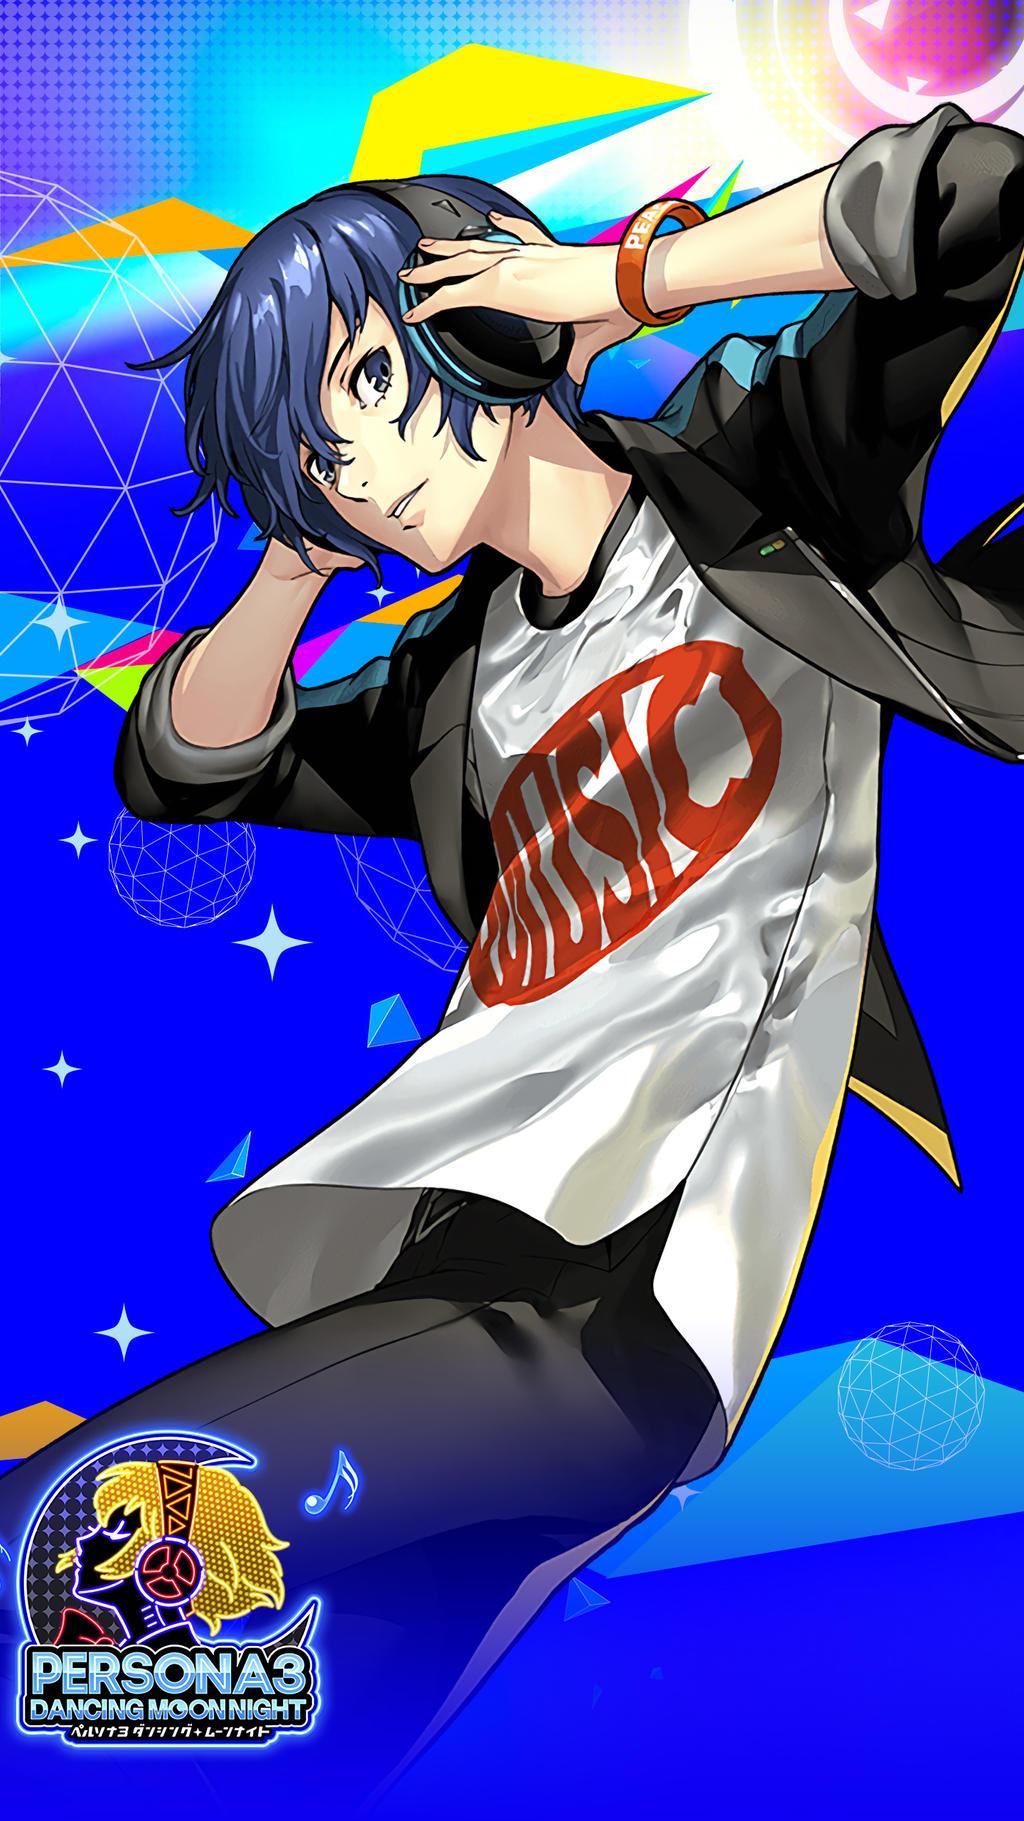 Persona 3 Dancing Moon Night Makoto Yuki Wallpaper By Farizf On